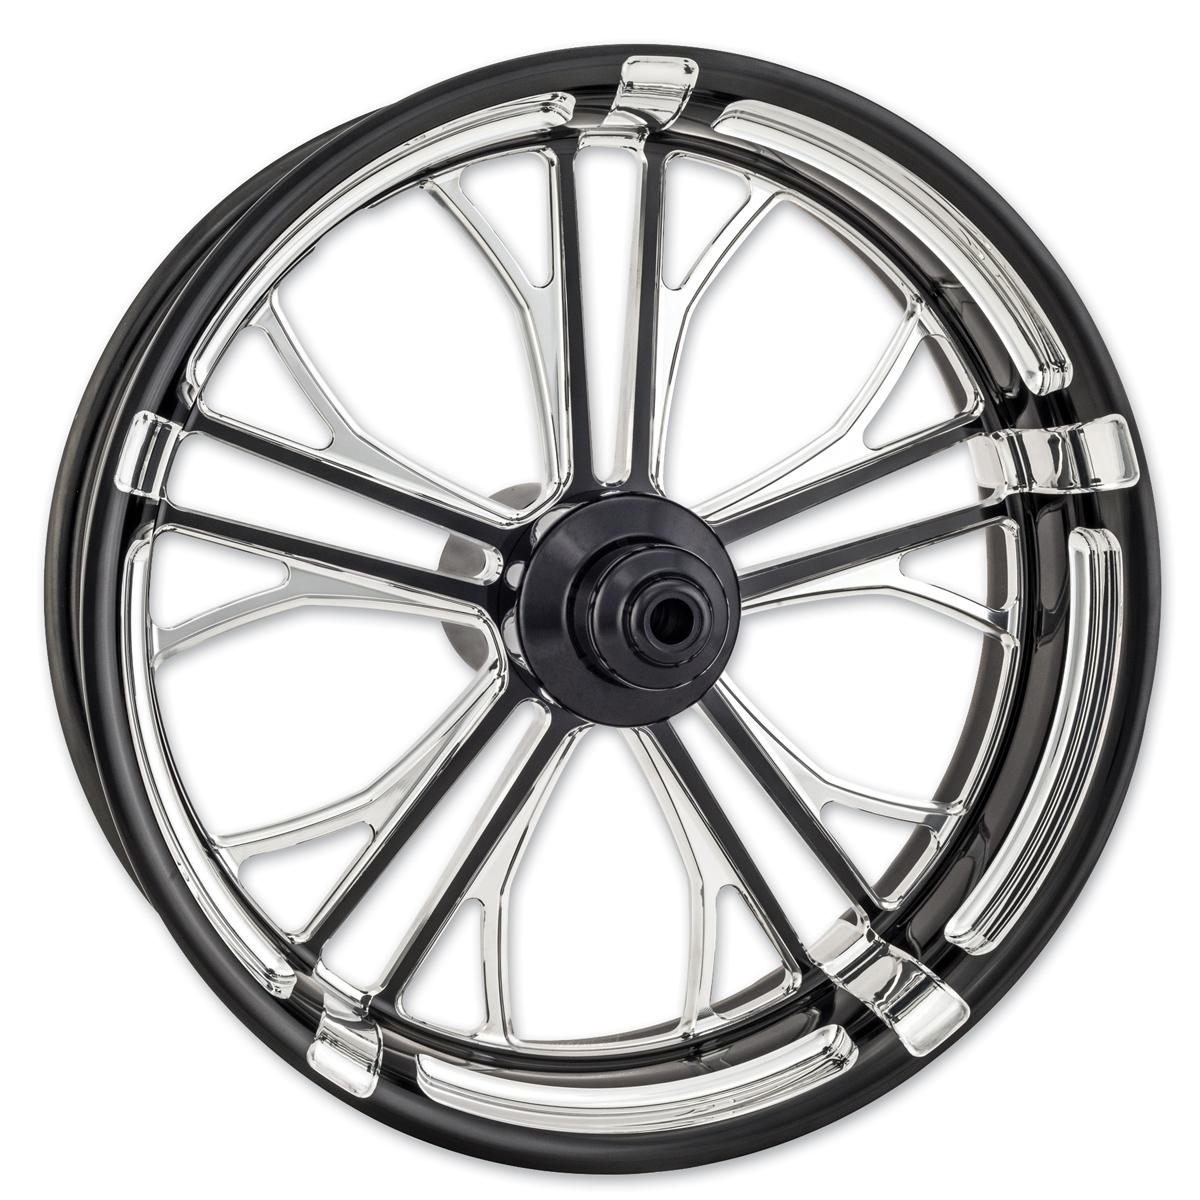 Performance Machine Dixon Platinum Cut Rear Wheel 18x5.5 ABS